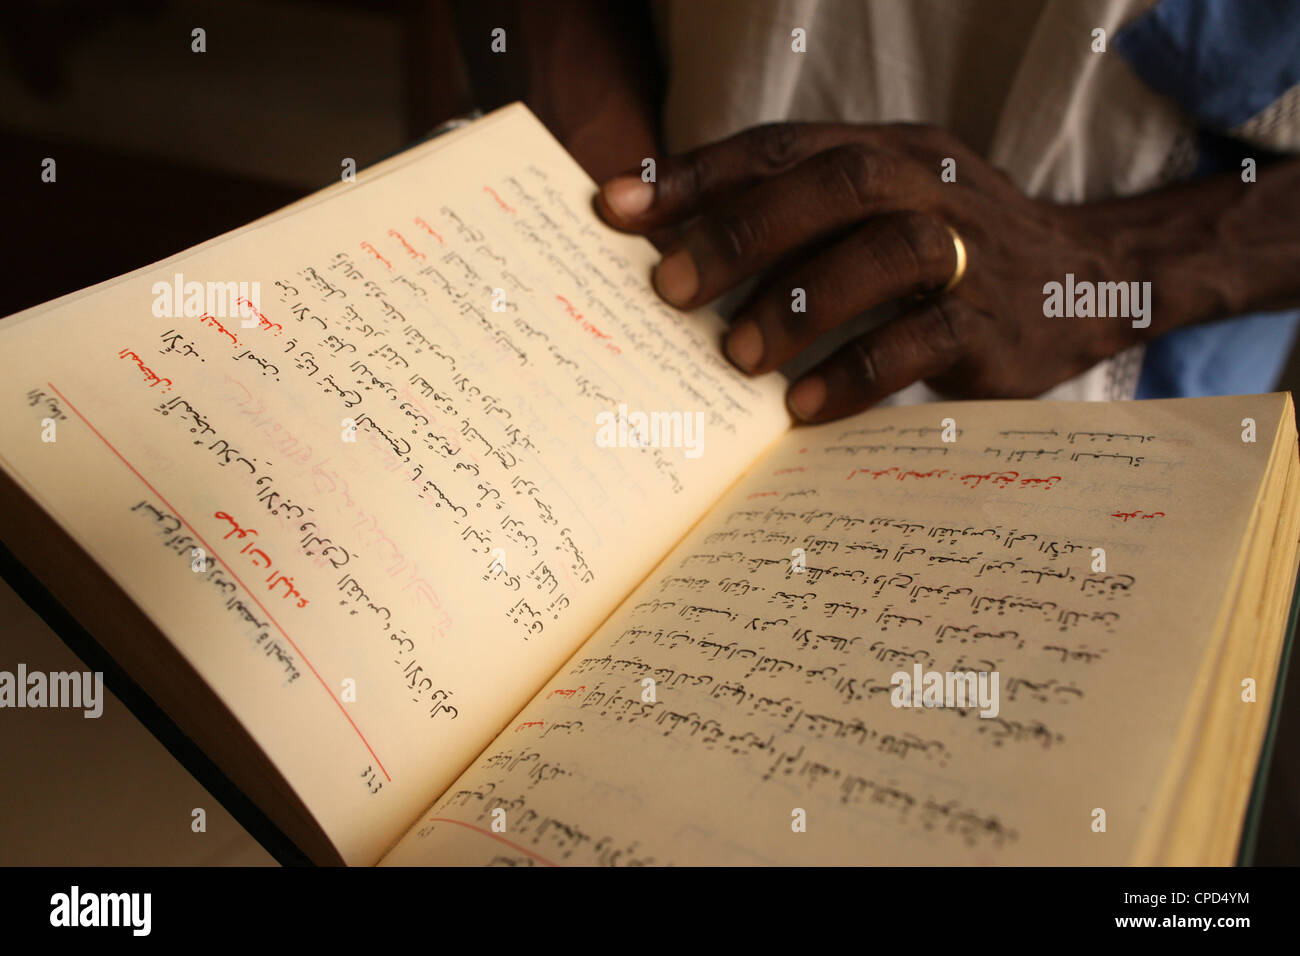 Arabisch Bibel in der maronitischen Kirche, Lome, Togo, West Afrika, Afrika Stockbild